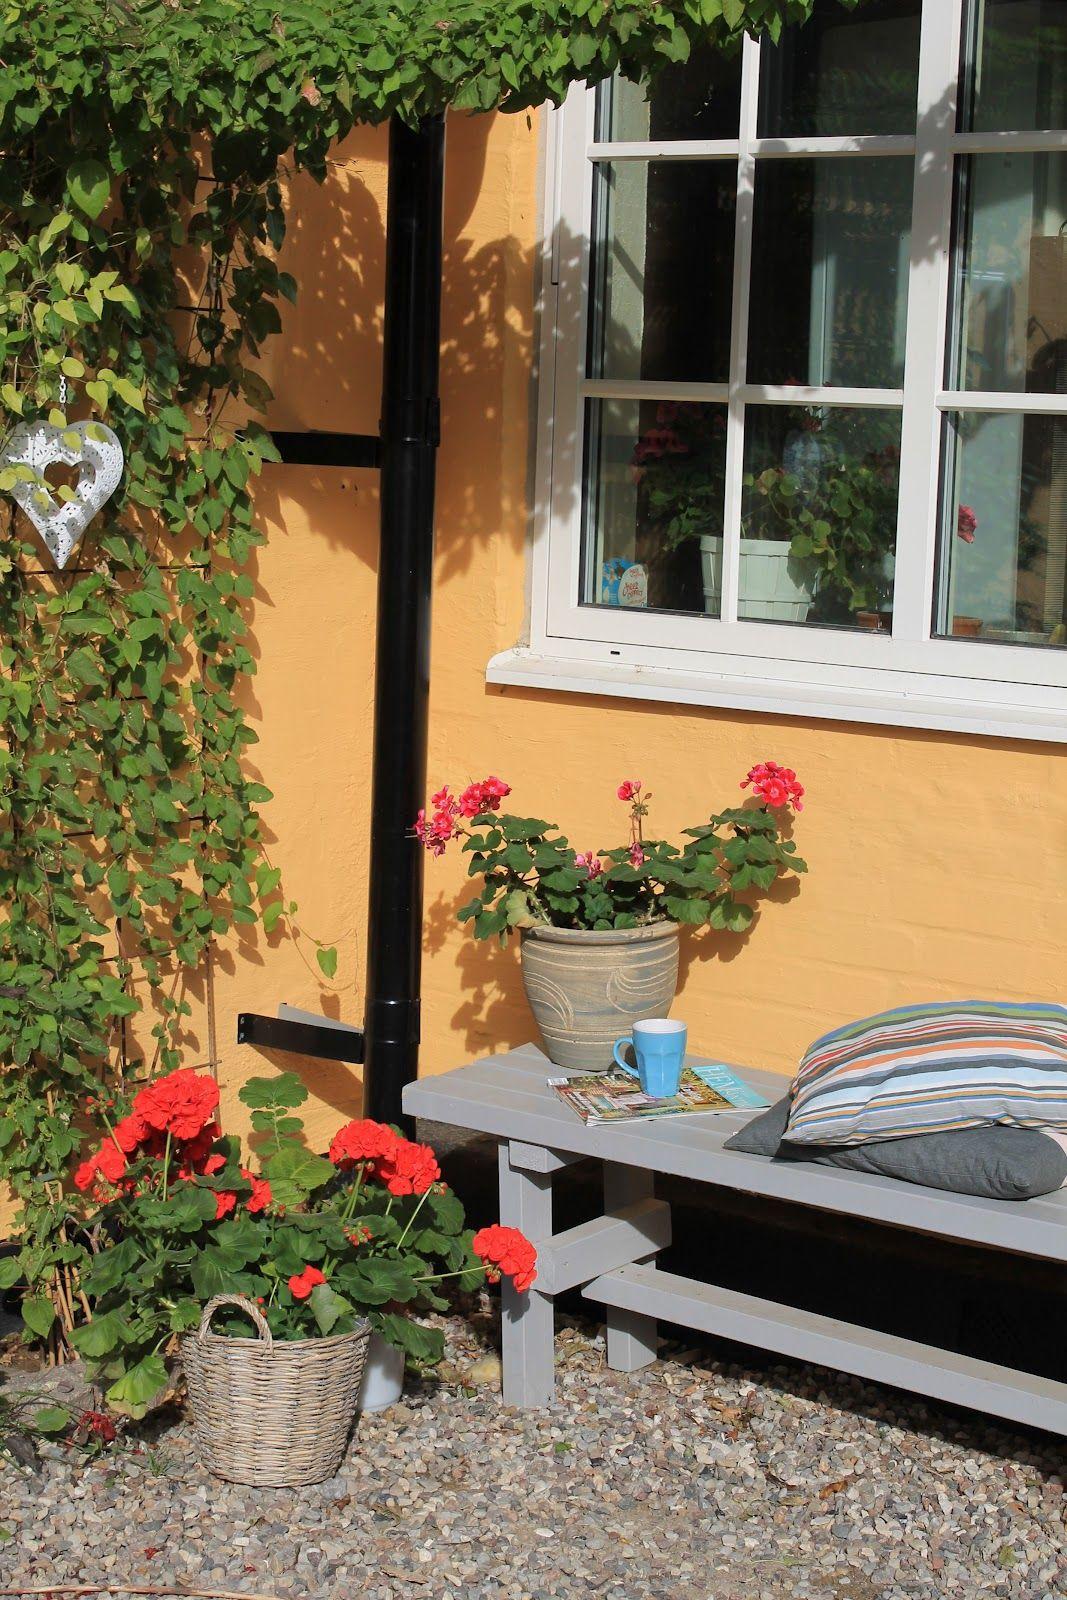 Outdoor reading nook (myfinnishdelights blog) | Outdoor ... on Backyard Nook Ideas id=24128